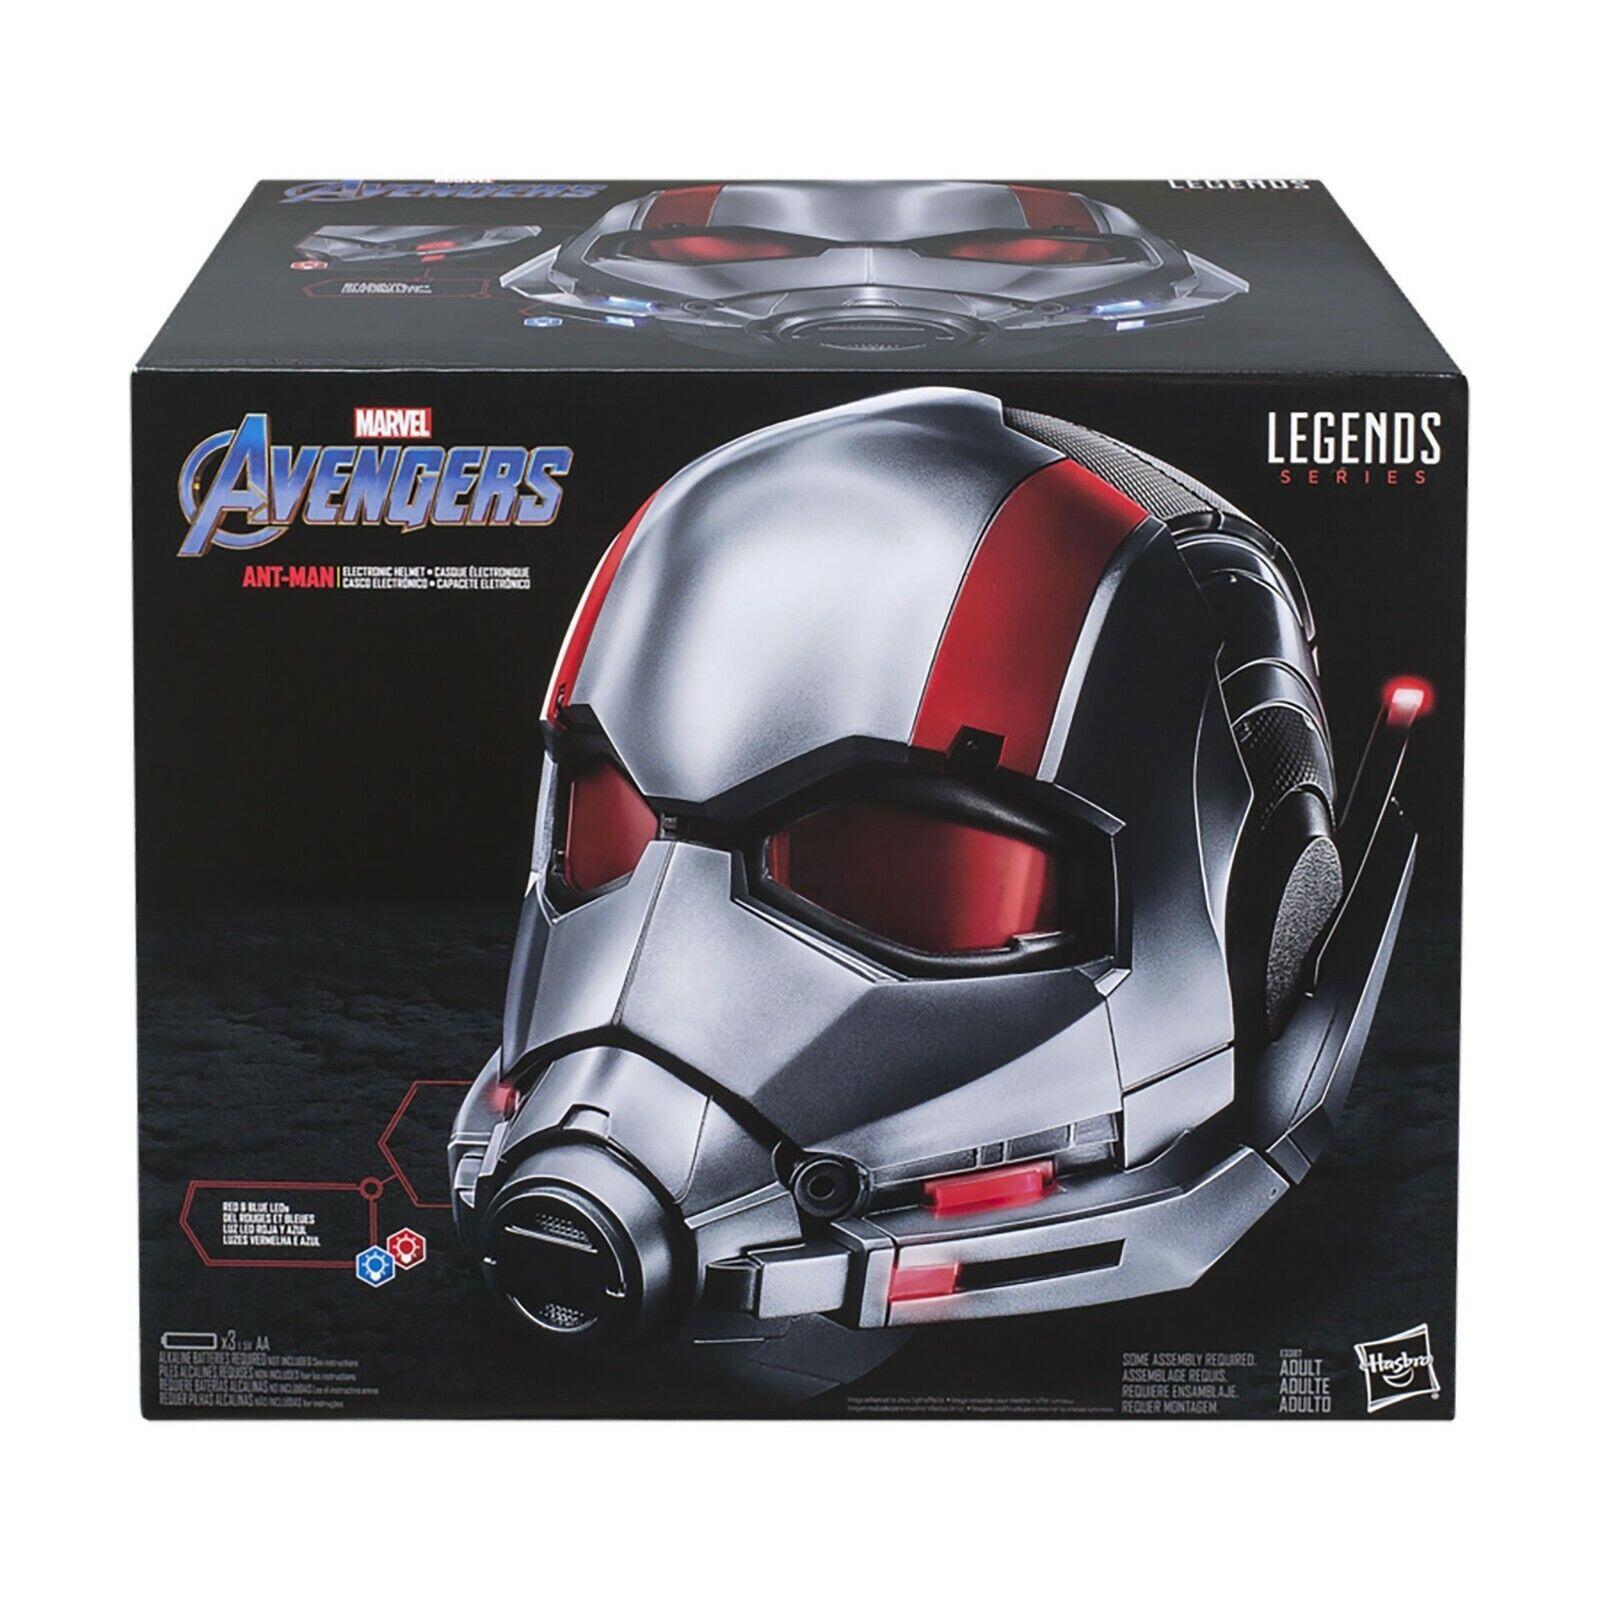 Marvel Legends 1 1 Scale ANT-MAN Premium Electronic Prop Replica Helmet Cosplay